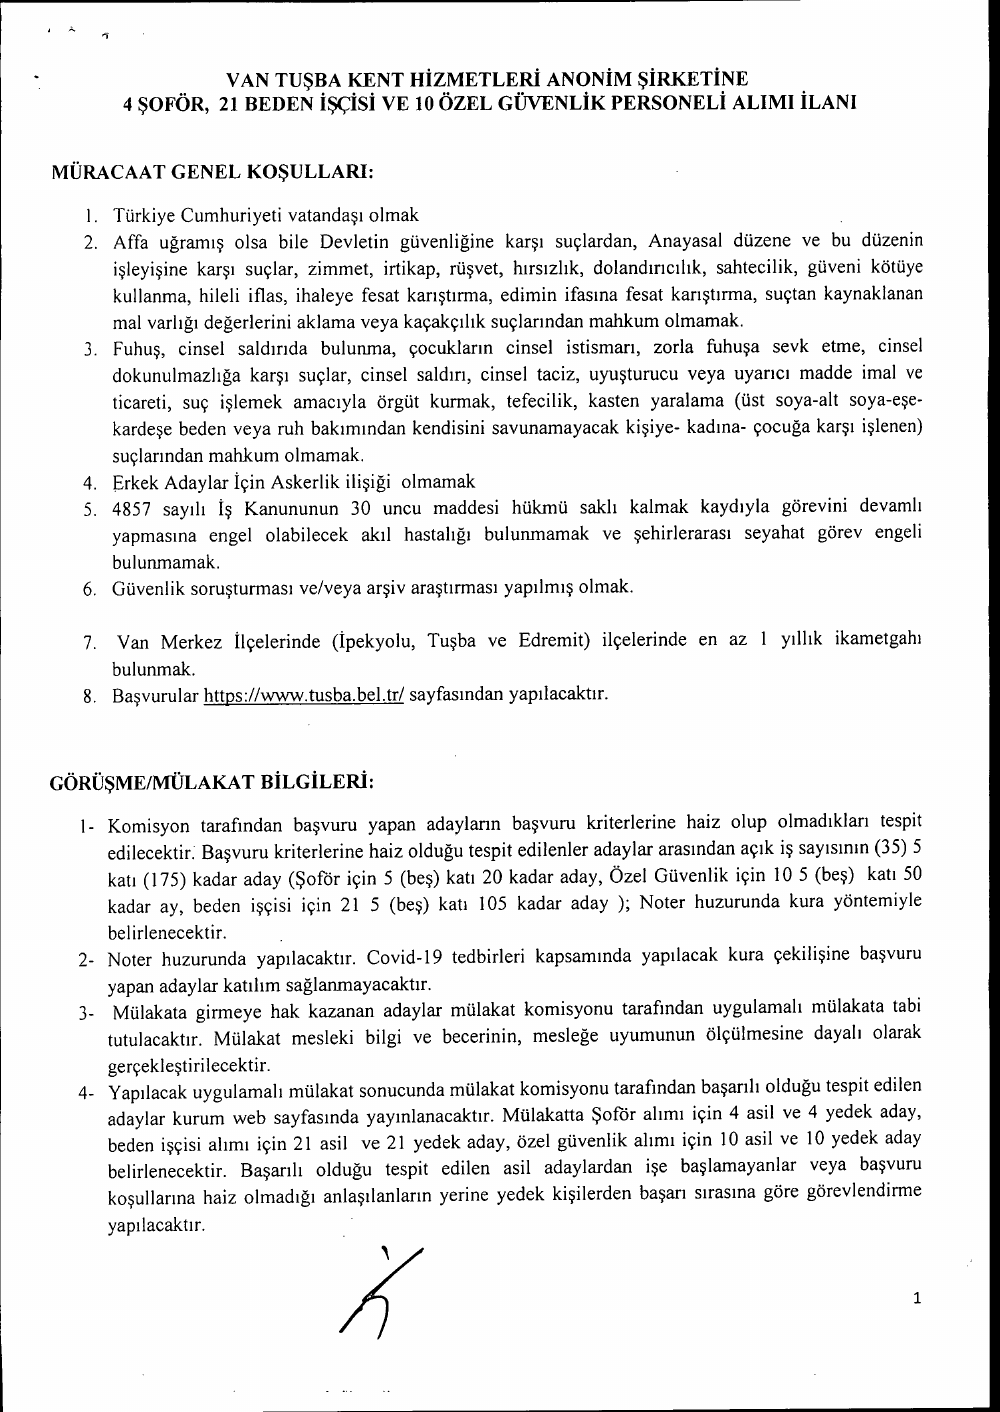 van-tusba-kent-hizmetleri-tic-a-s-03-05-2021-000002.png